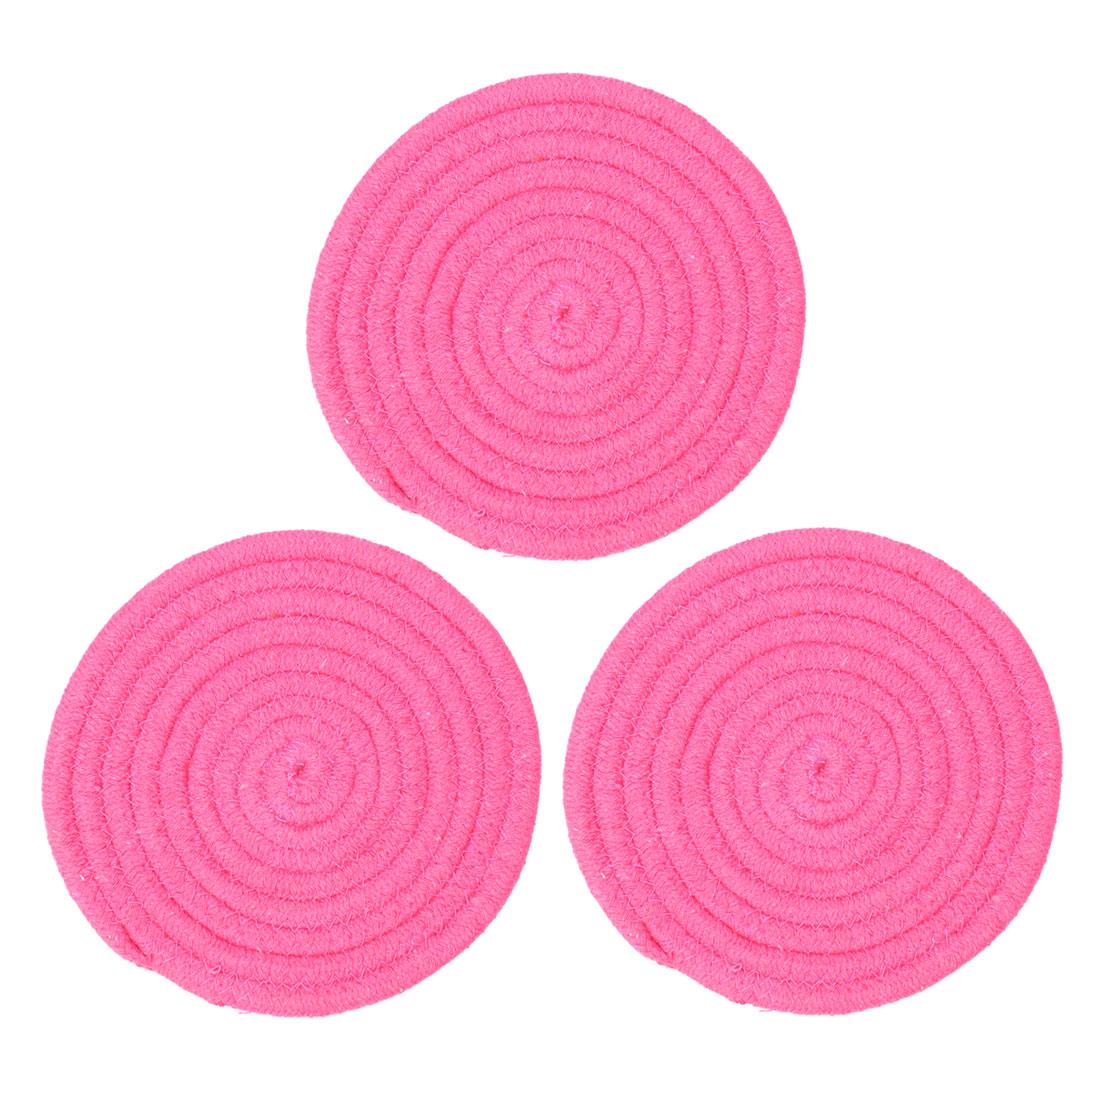 "Round Cotton Thread Weave Heat Resistant Mat 7"" Dia Placemat/Spoon Rest/Coasters Mats, Kitchen Dining Mats Pink 3pcs"